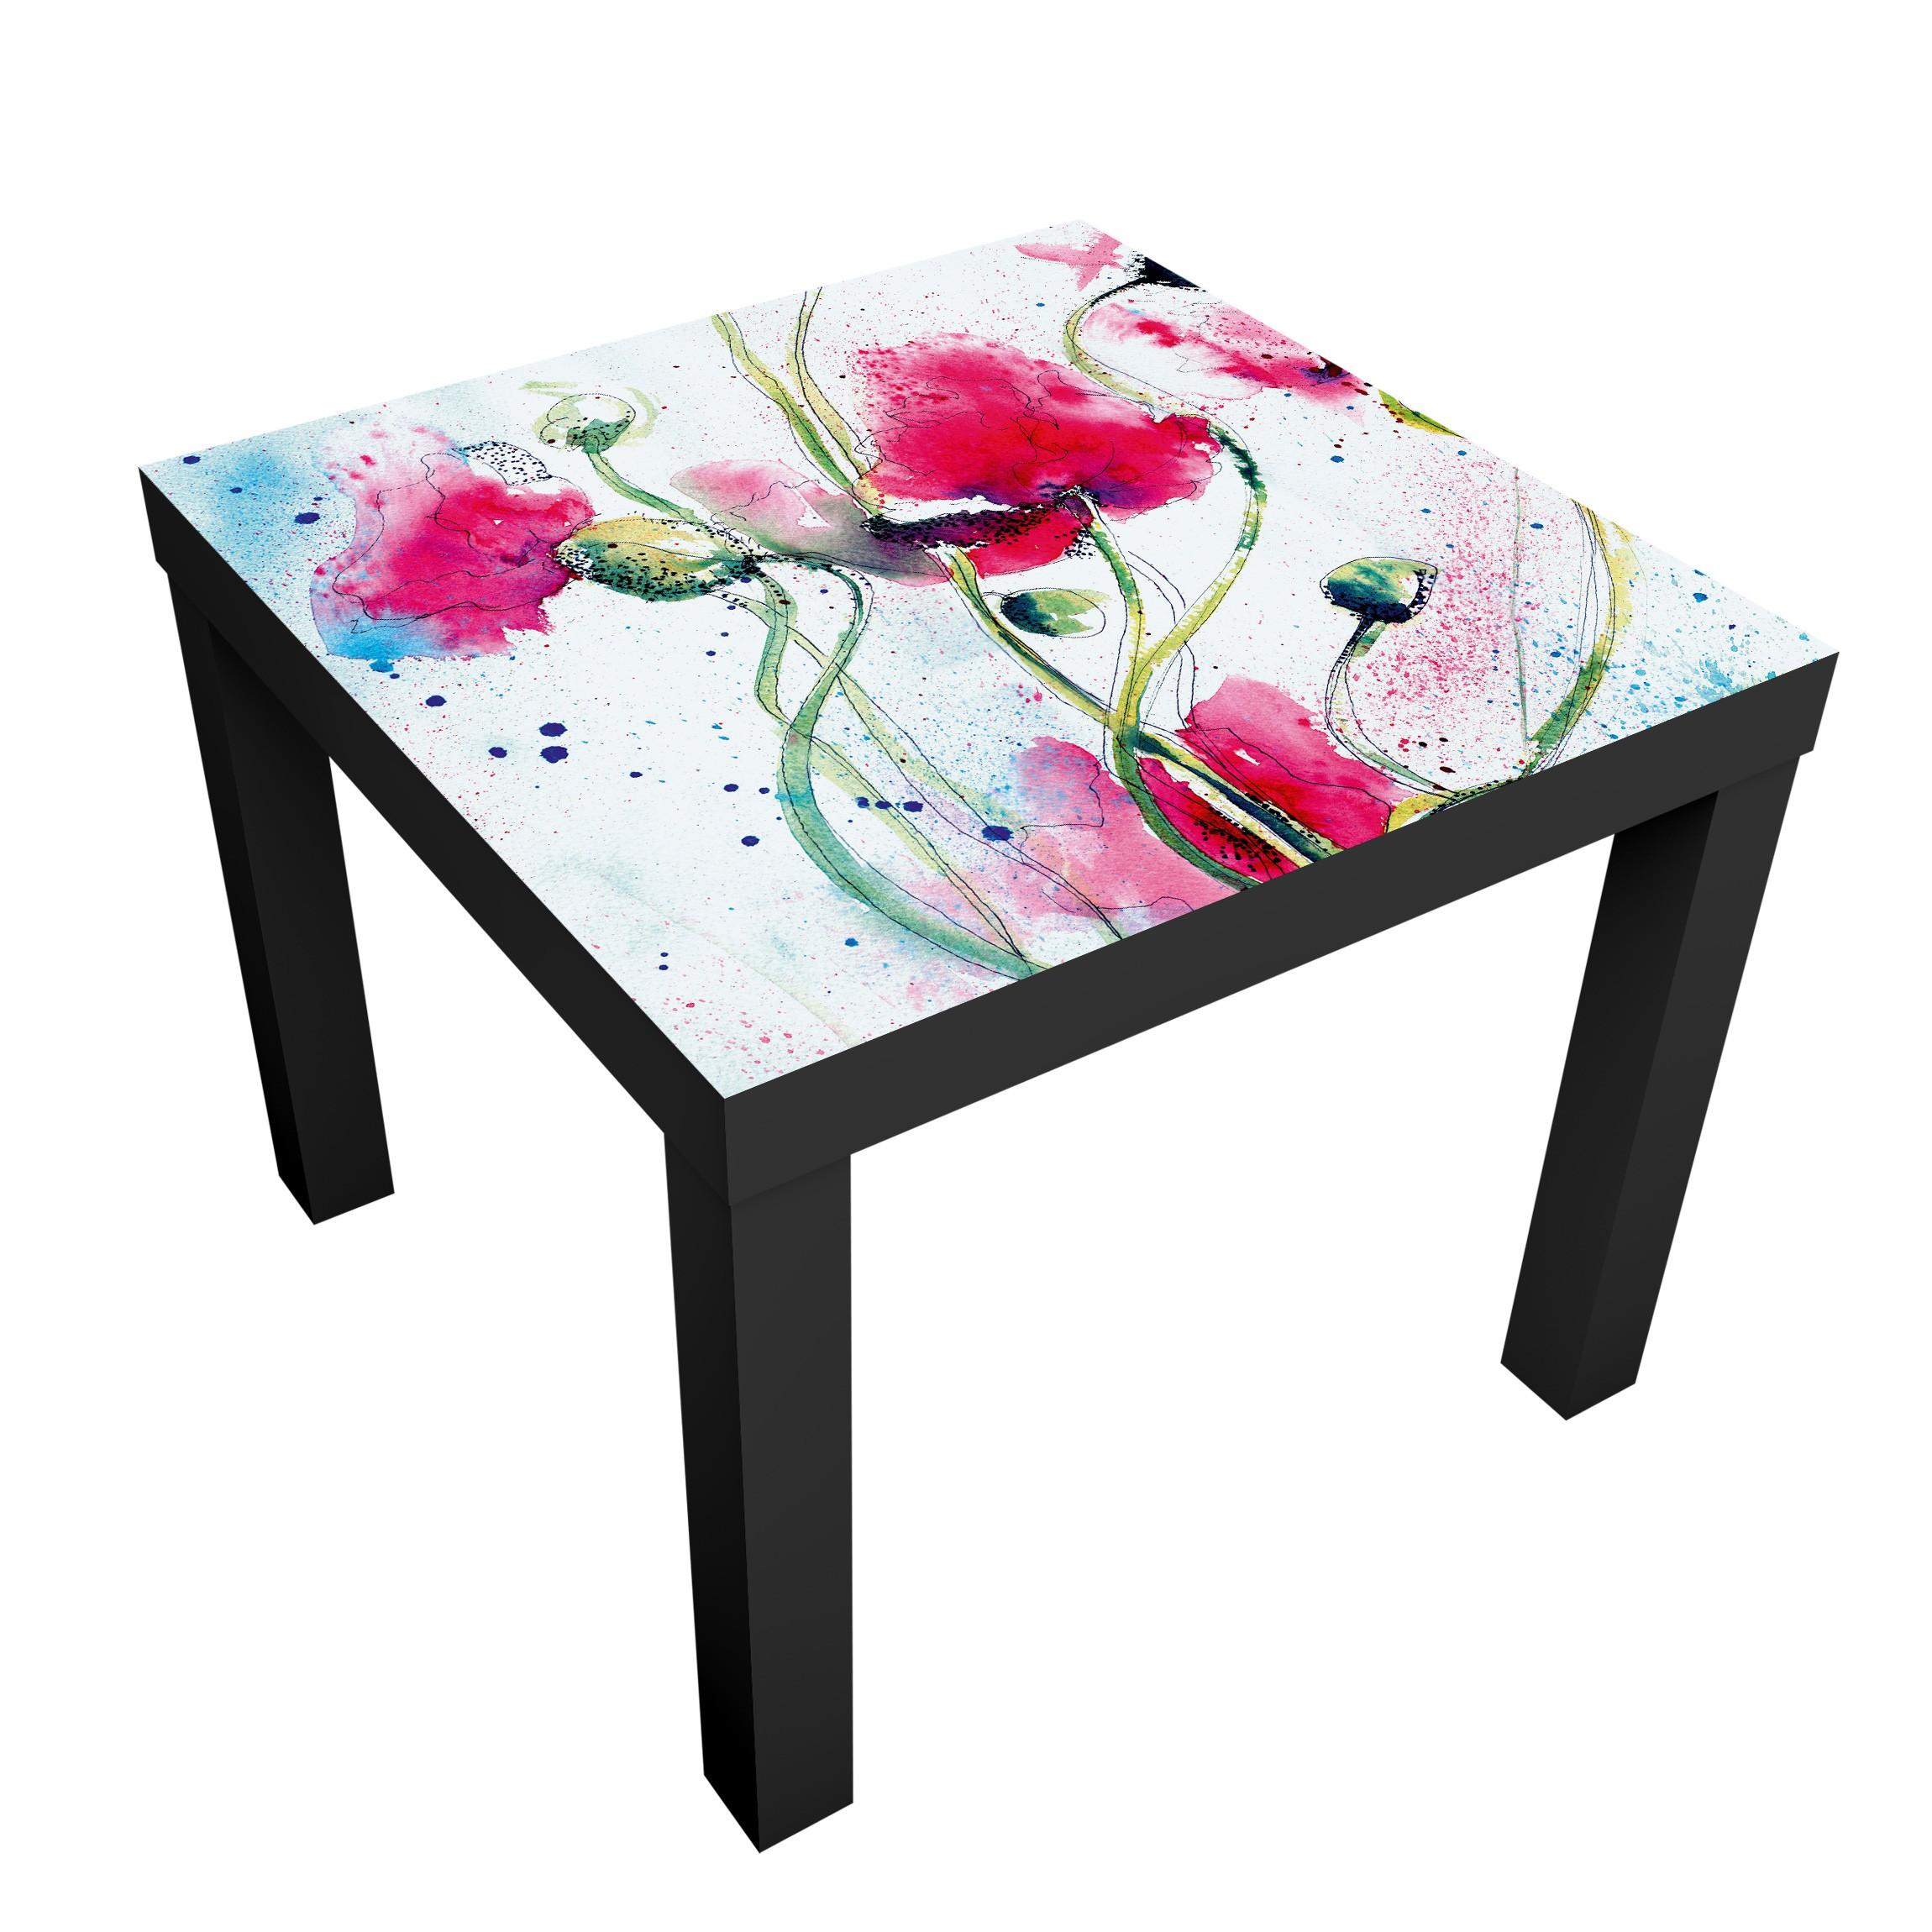 Carta adesiva per mobili ikea lack tavolino painted poppies - Carte adesive per mobili ...